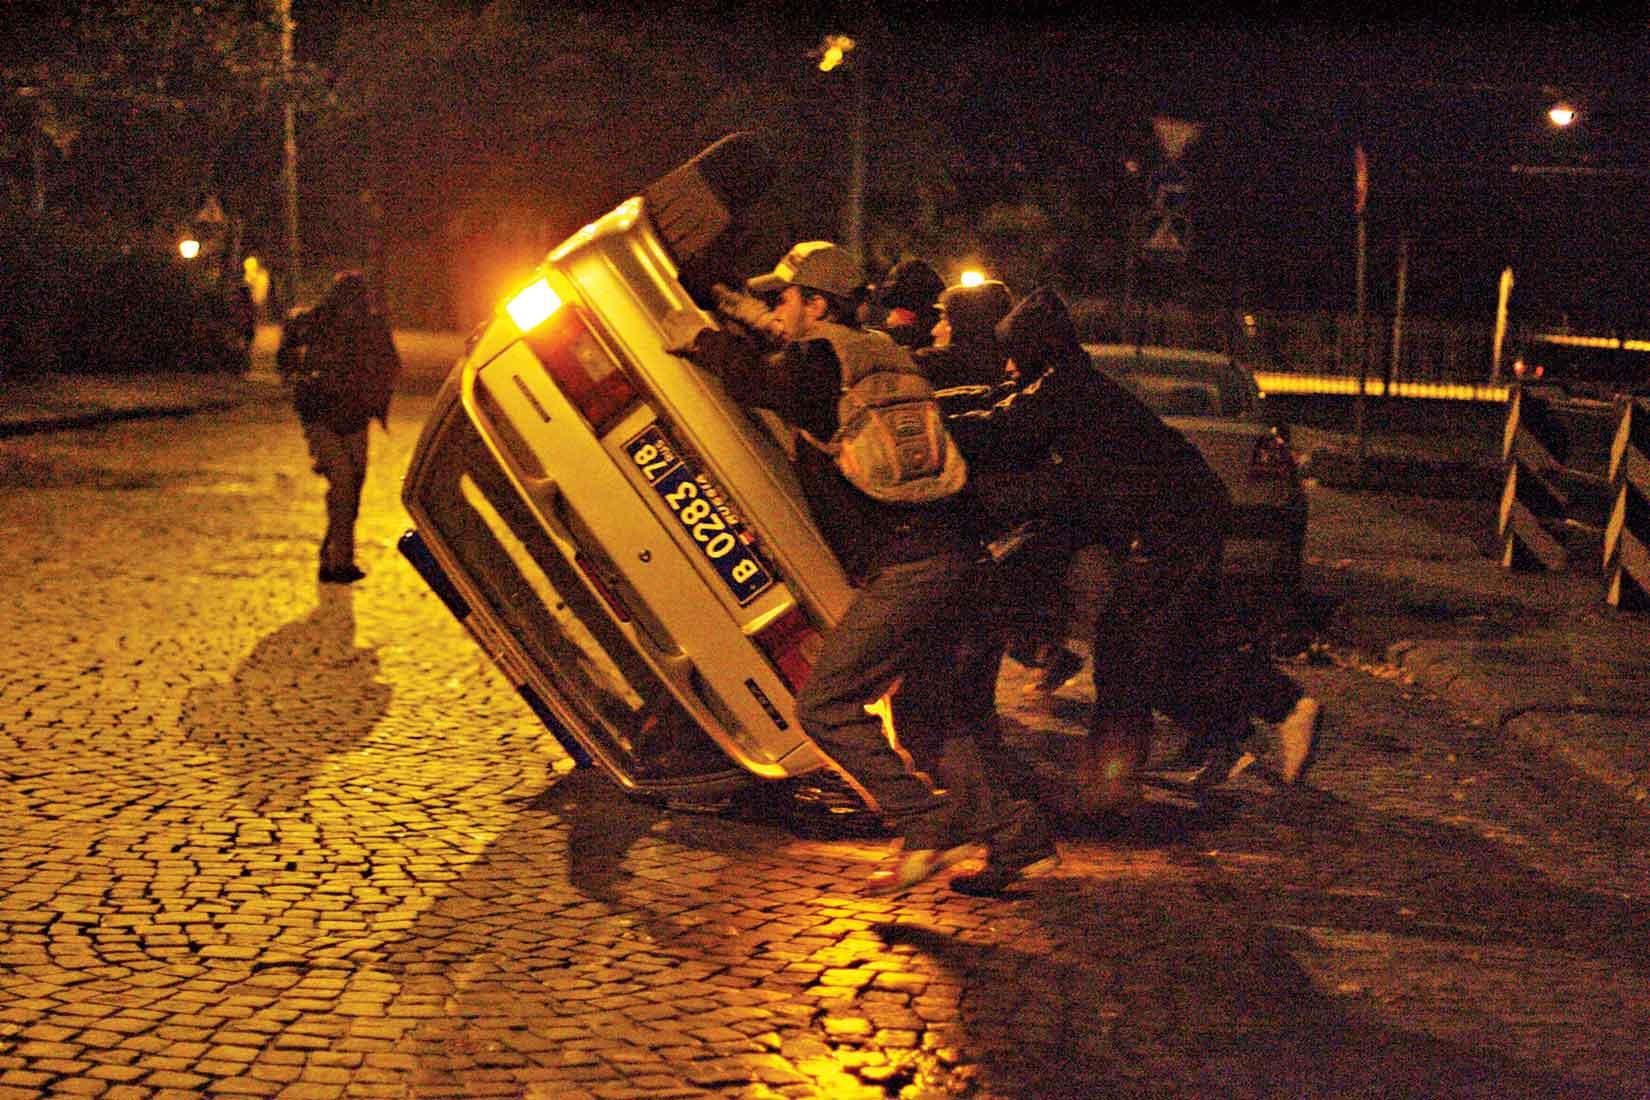 The Palace Revolution, September 2010, St. Petersburg.